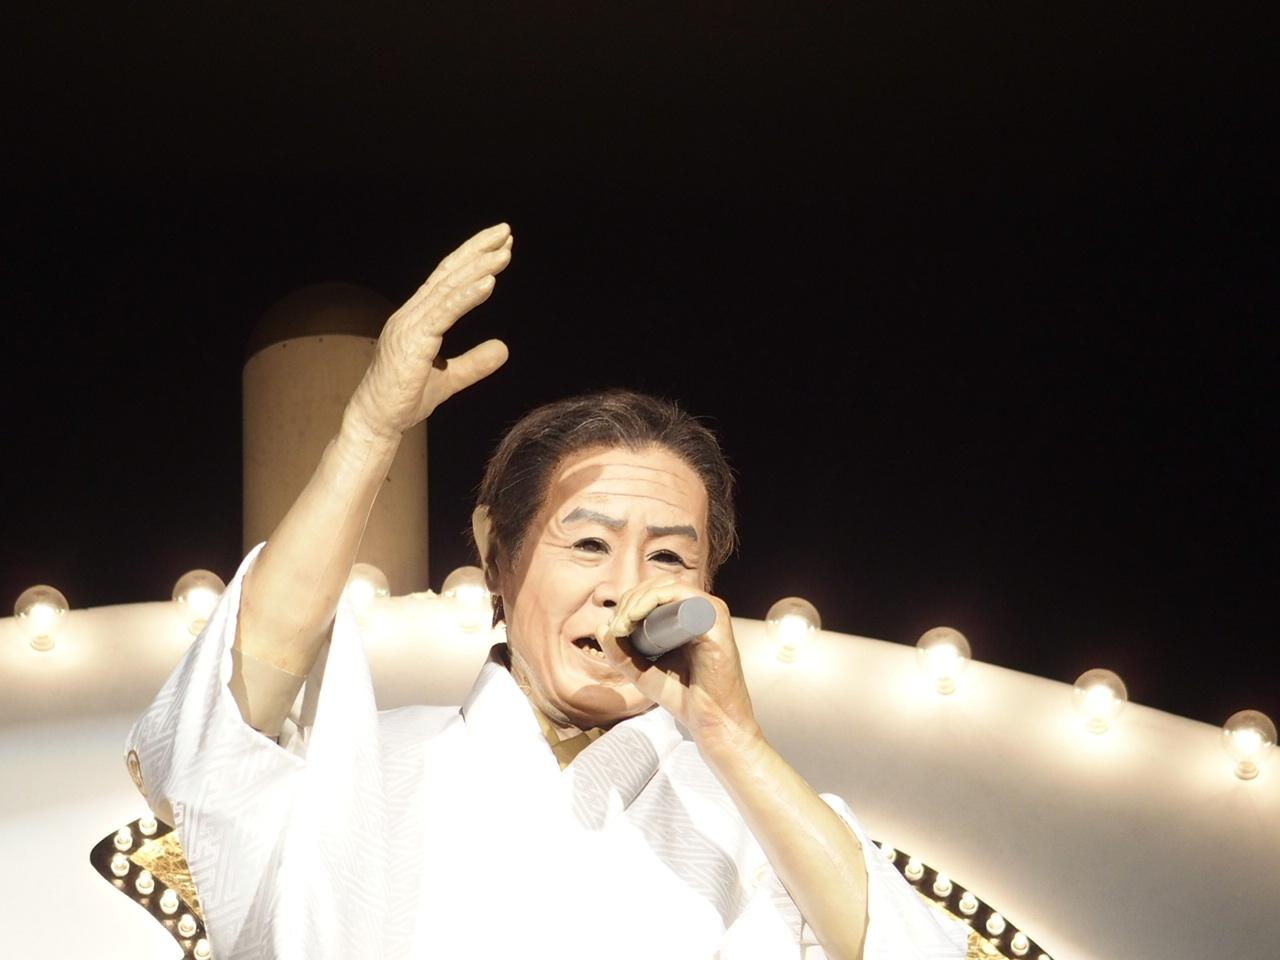 函館の北島三郎記念館